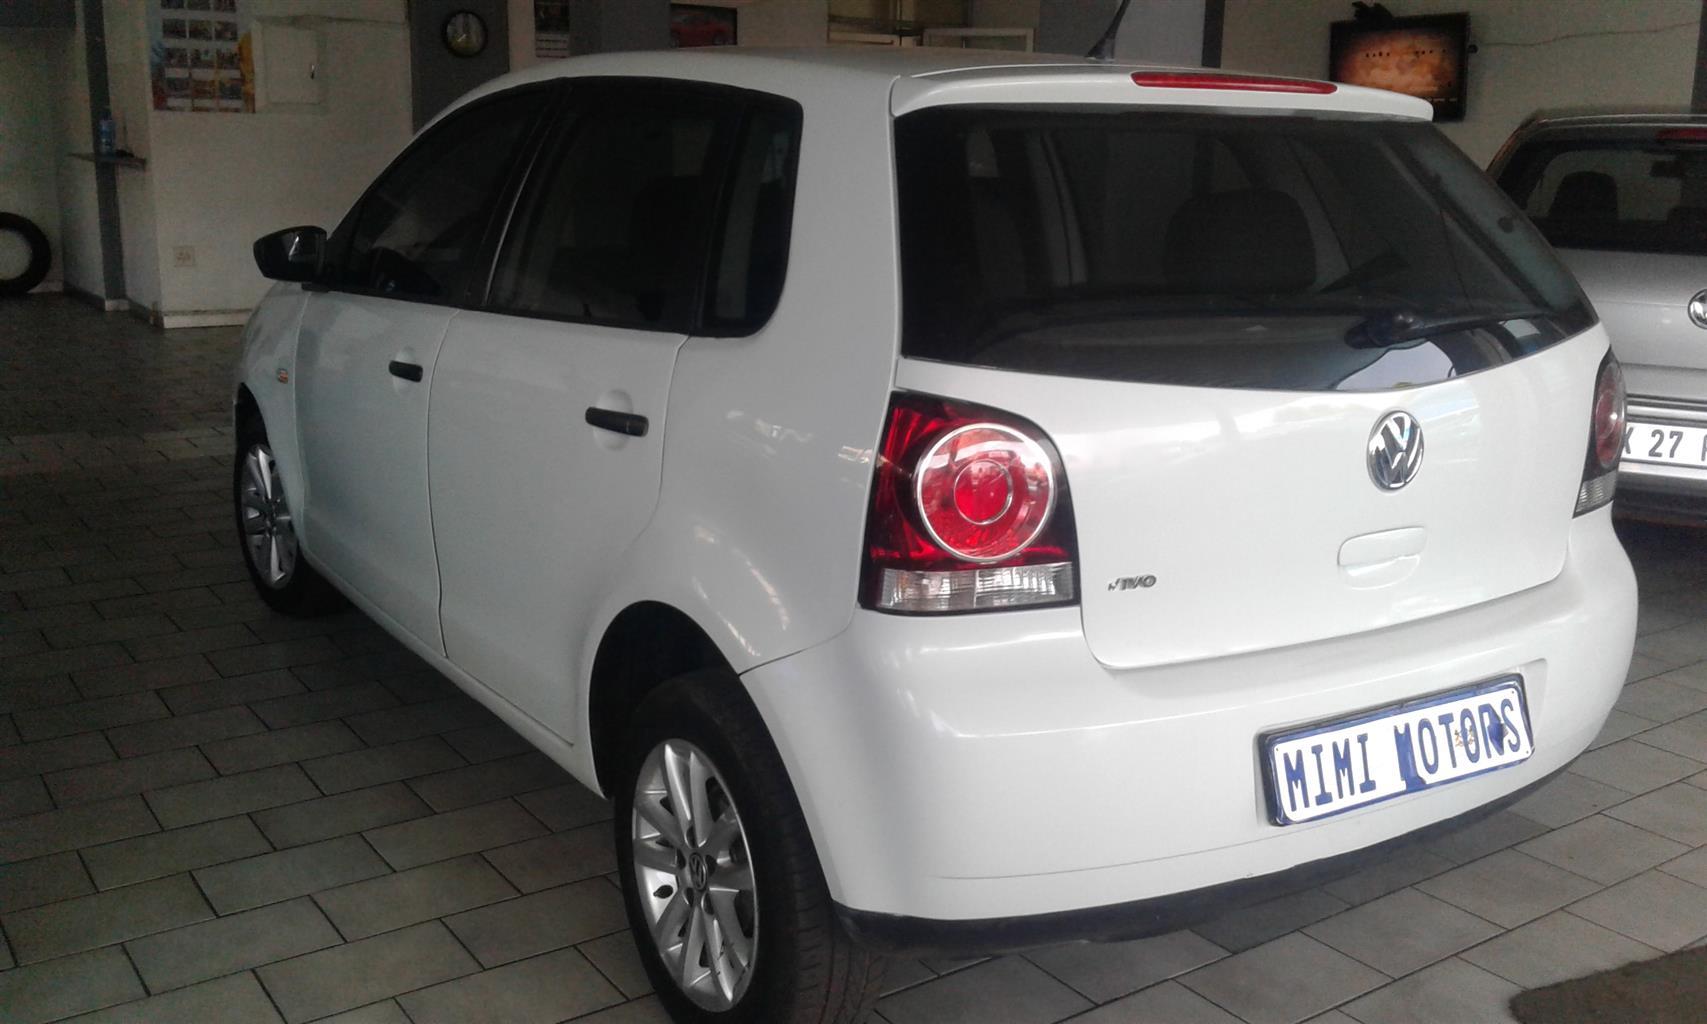 2015 VW Polo Vivo hatch 1.4 Conceptline